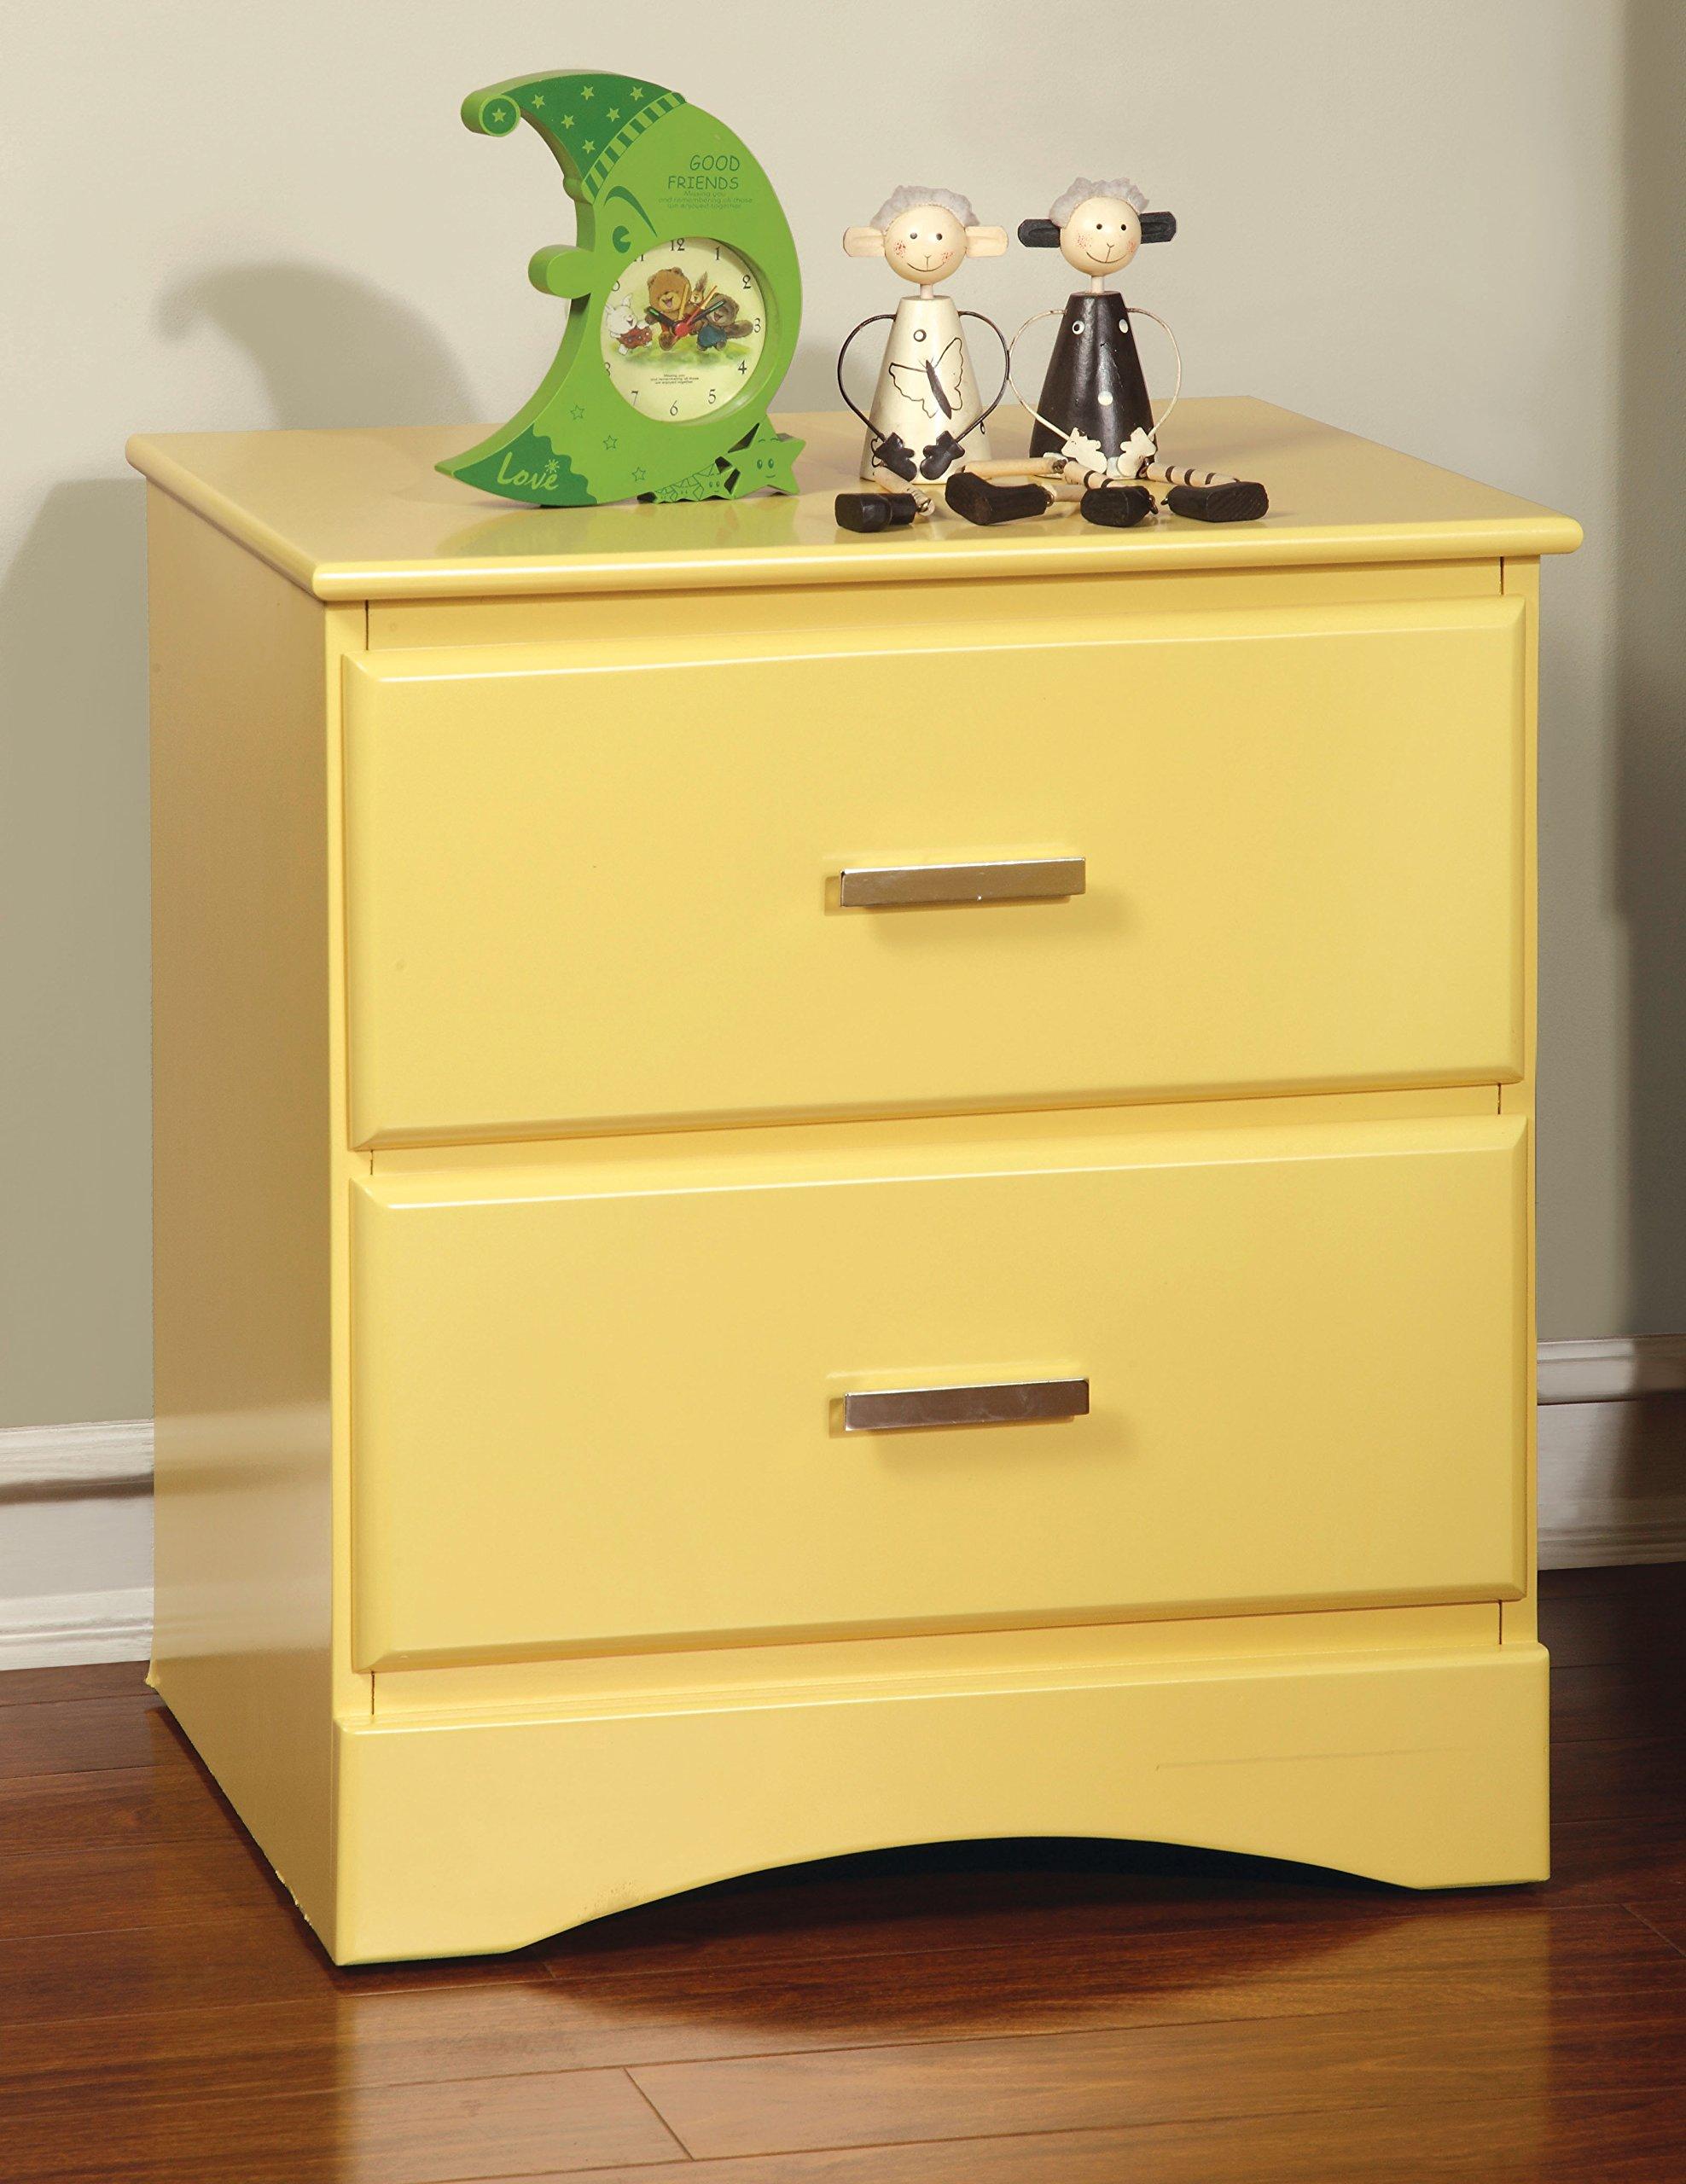 Furniture of America Kolora Youth Nightstand, Yellow